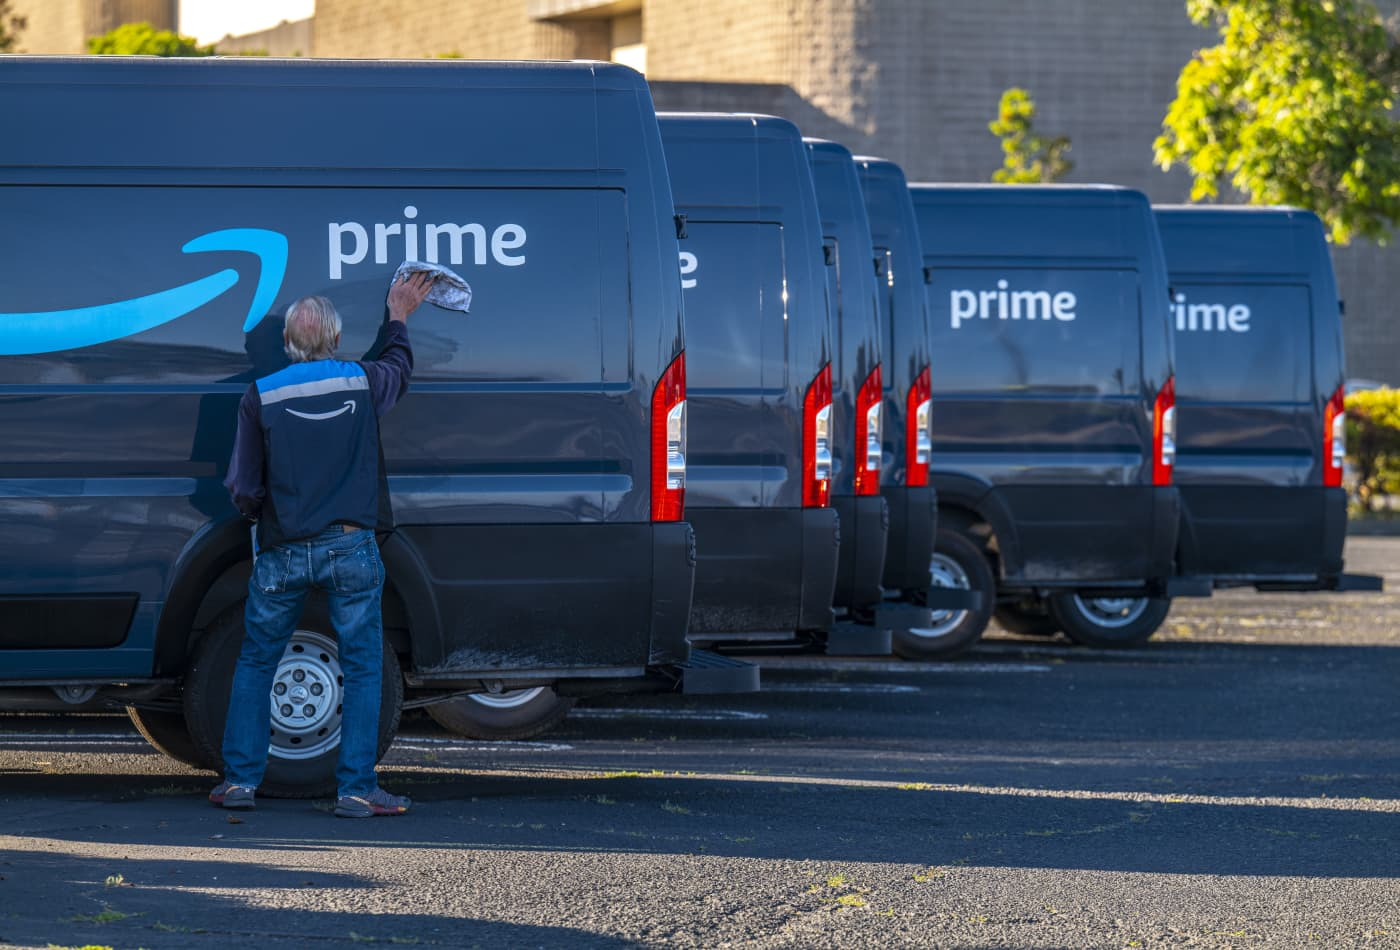 JPMorgan says buy Amazon as it's set to pass Walmart as the largest U.S. retailer next year